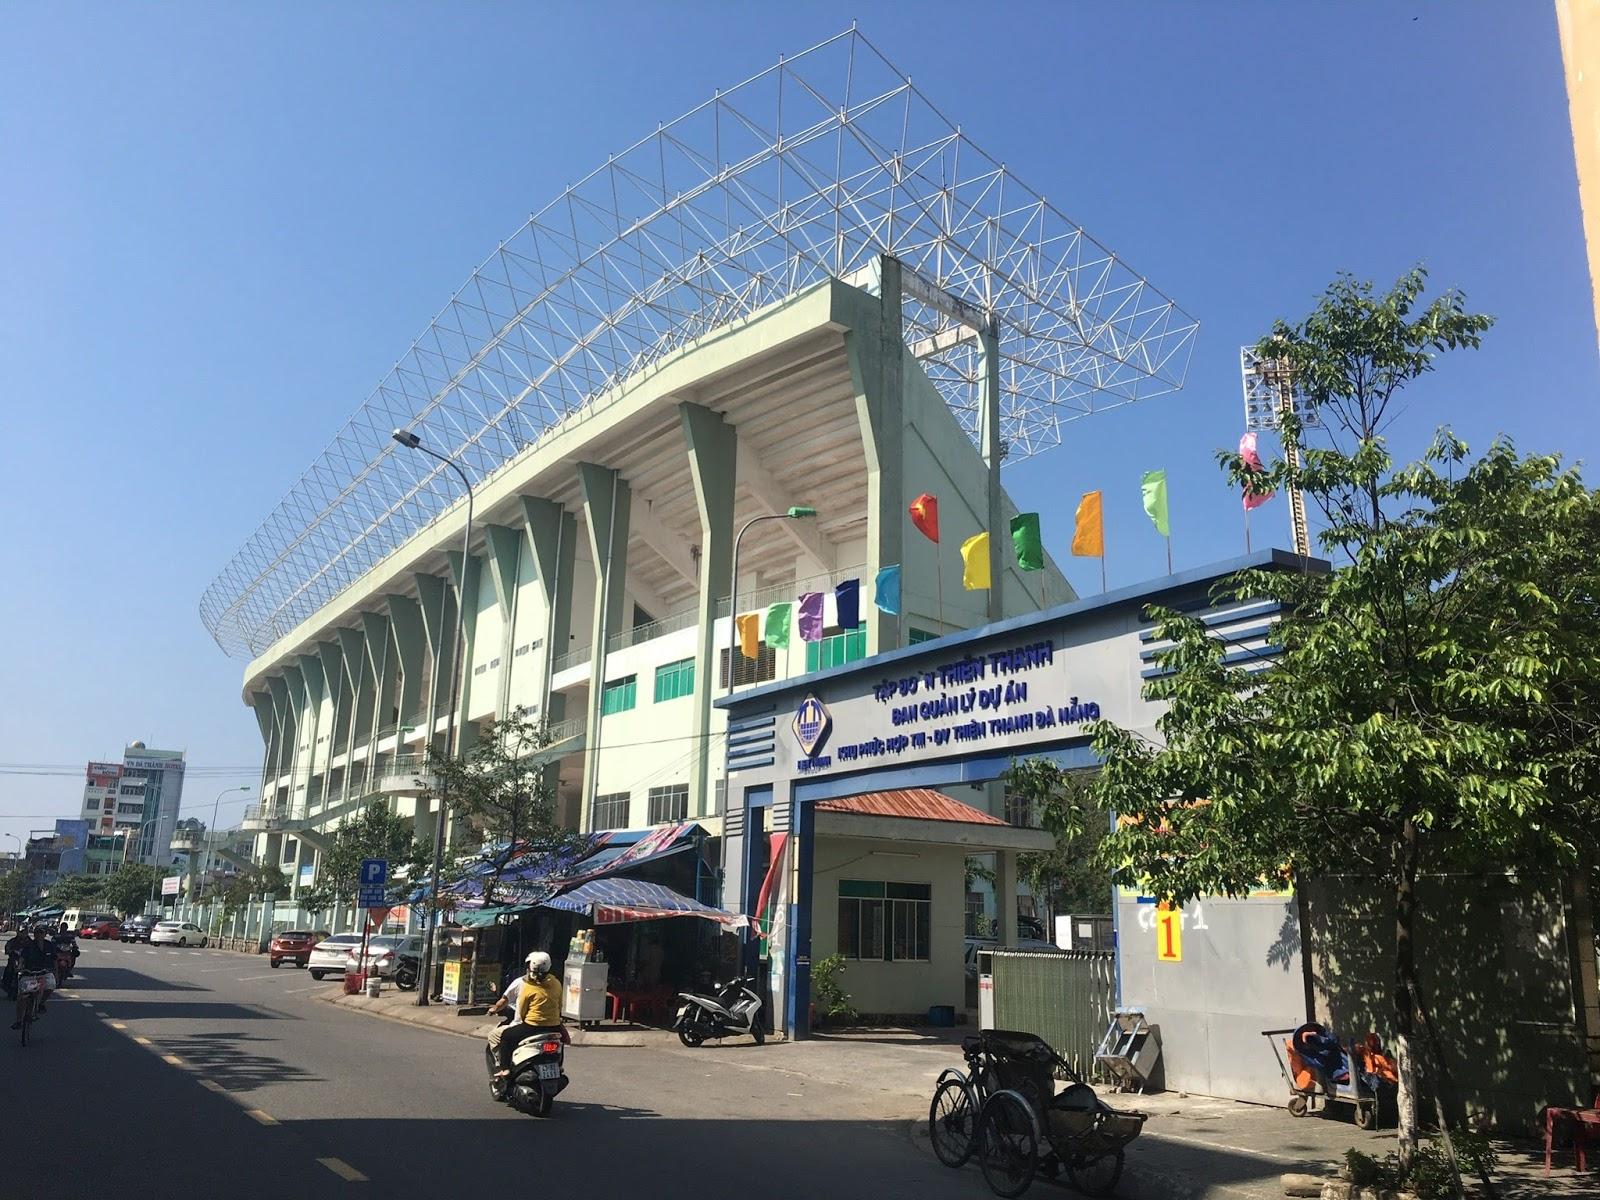 Da Nangin vanha stadion